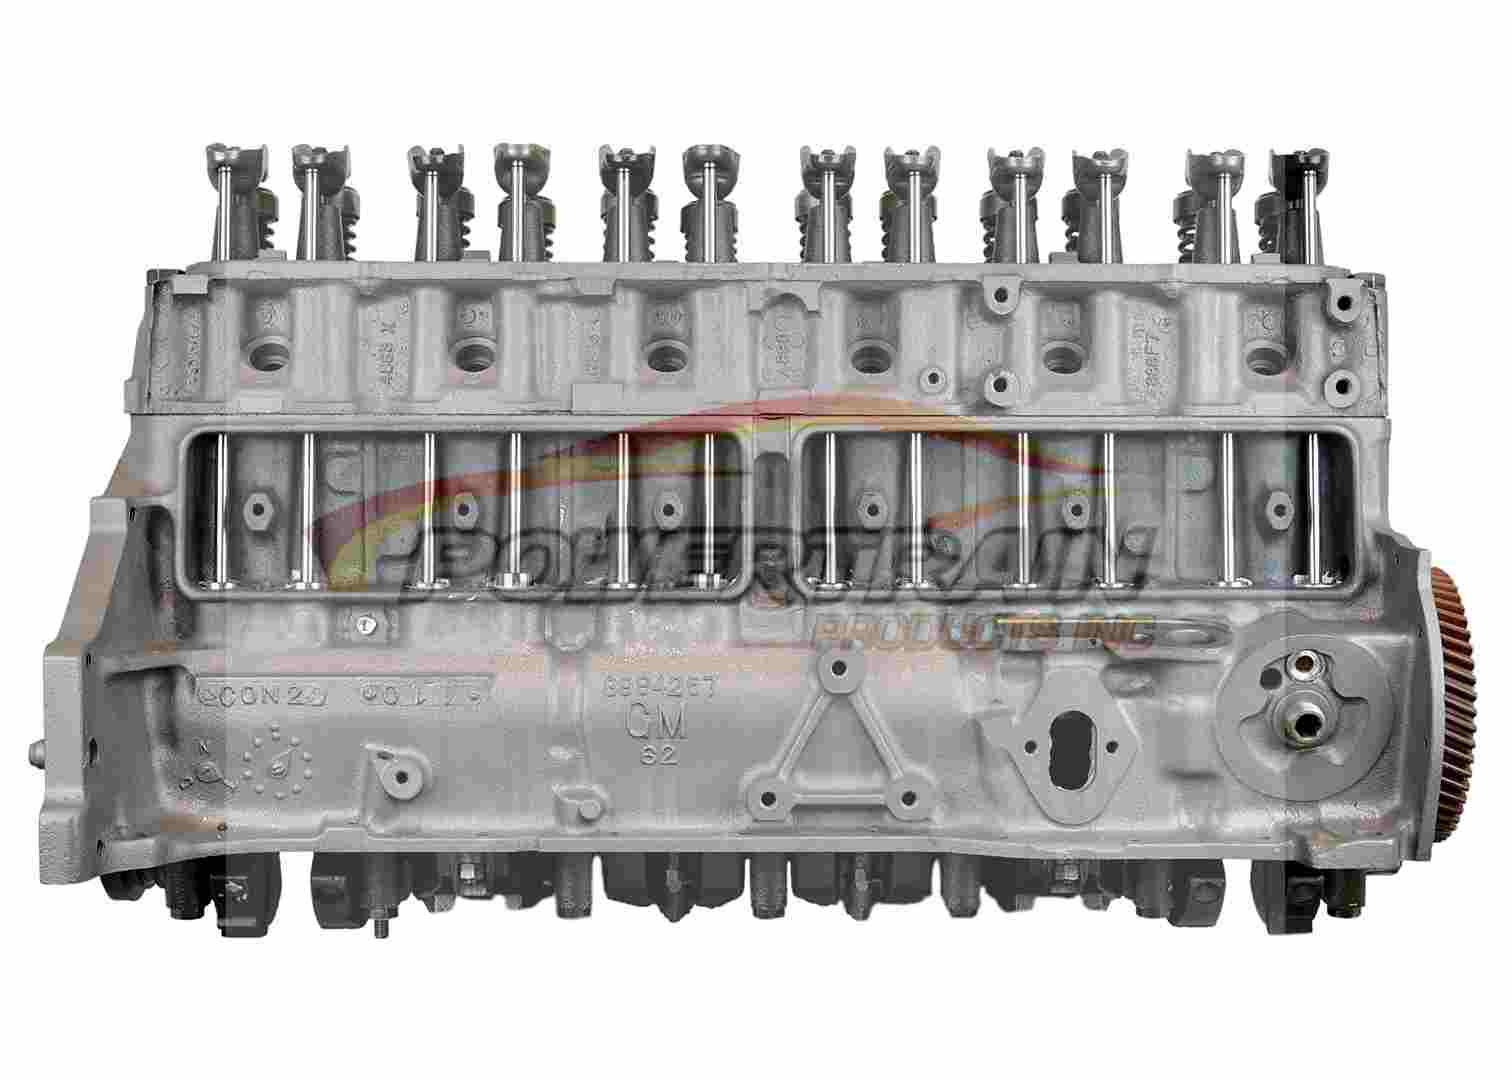 All Chevy chevy 250 engine Chevy 250 engine 68-72 comp engine